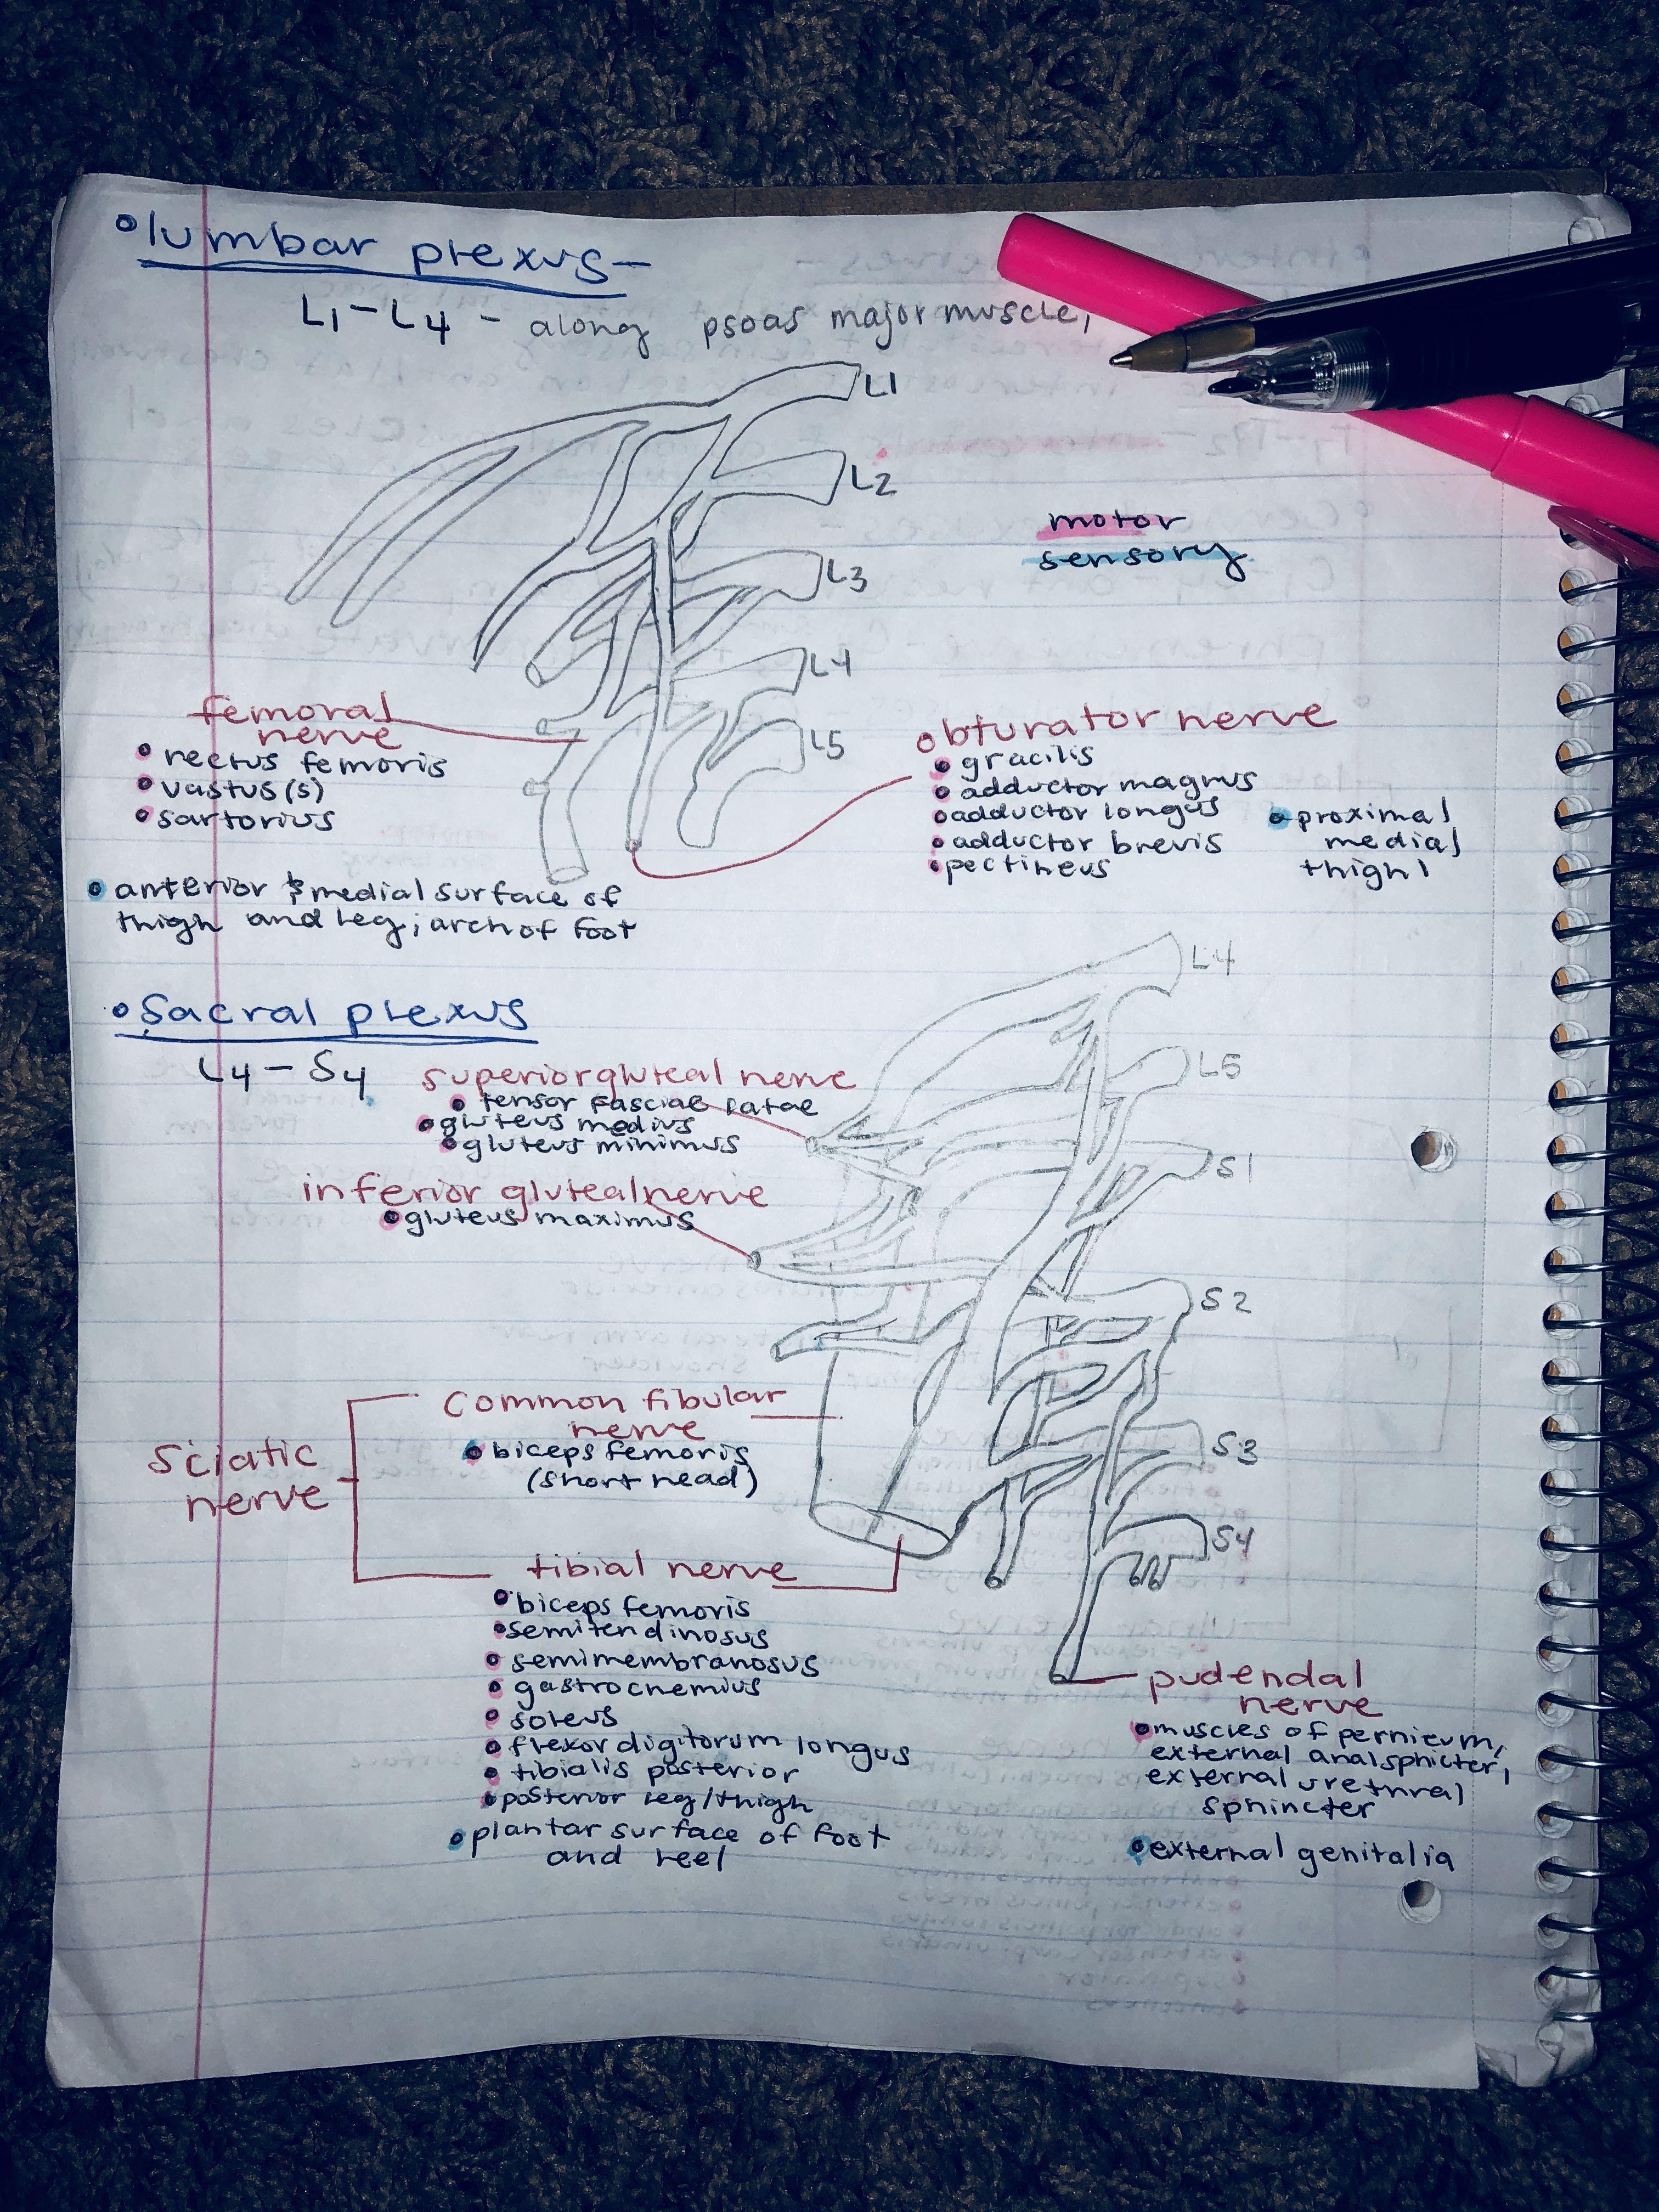 Pin by Saylor on Anatomy | Pinterest | Anatomy